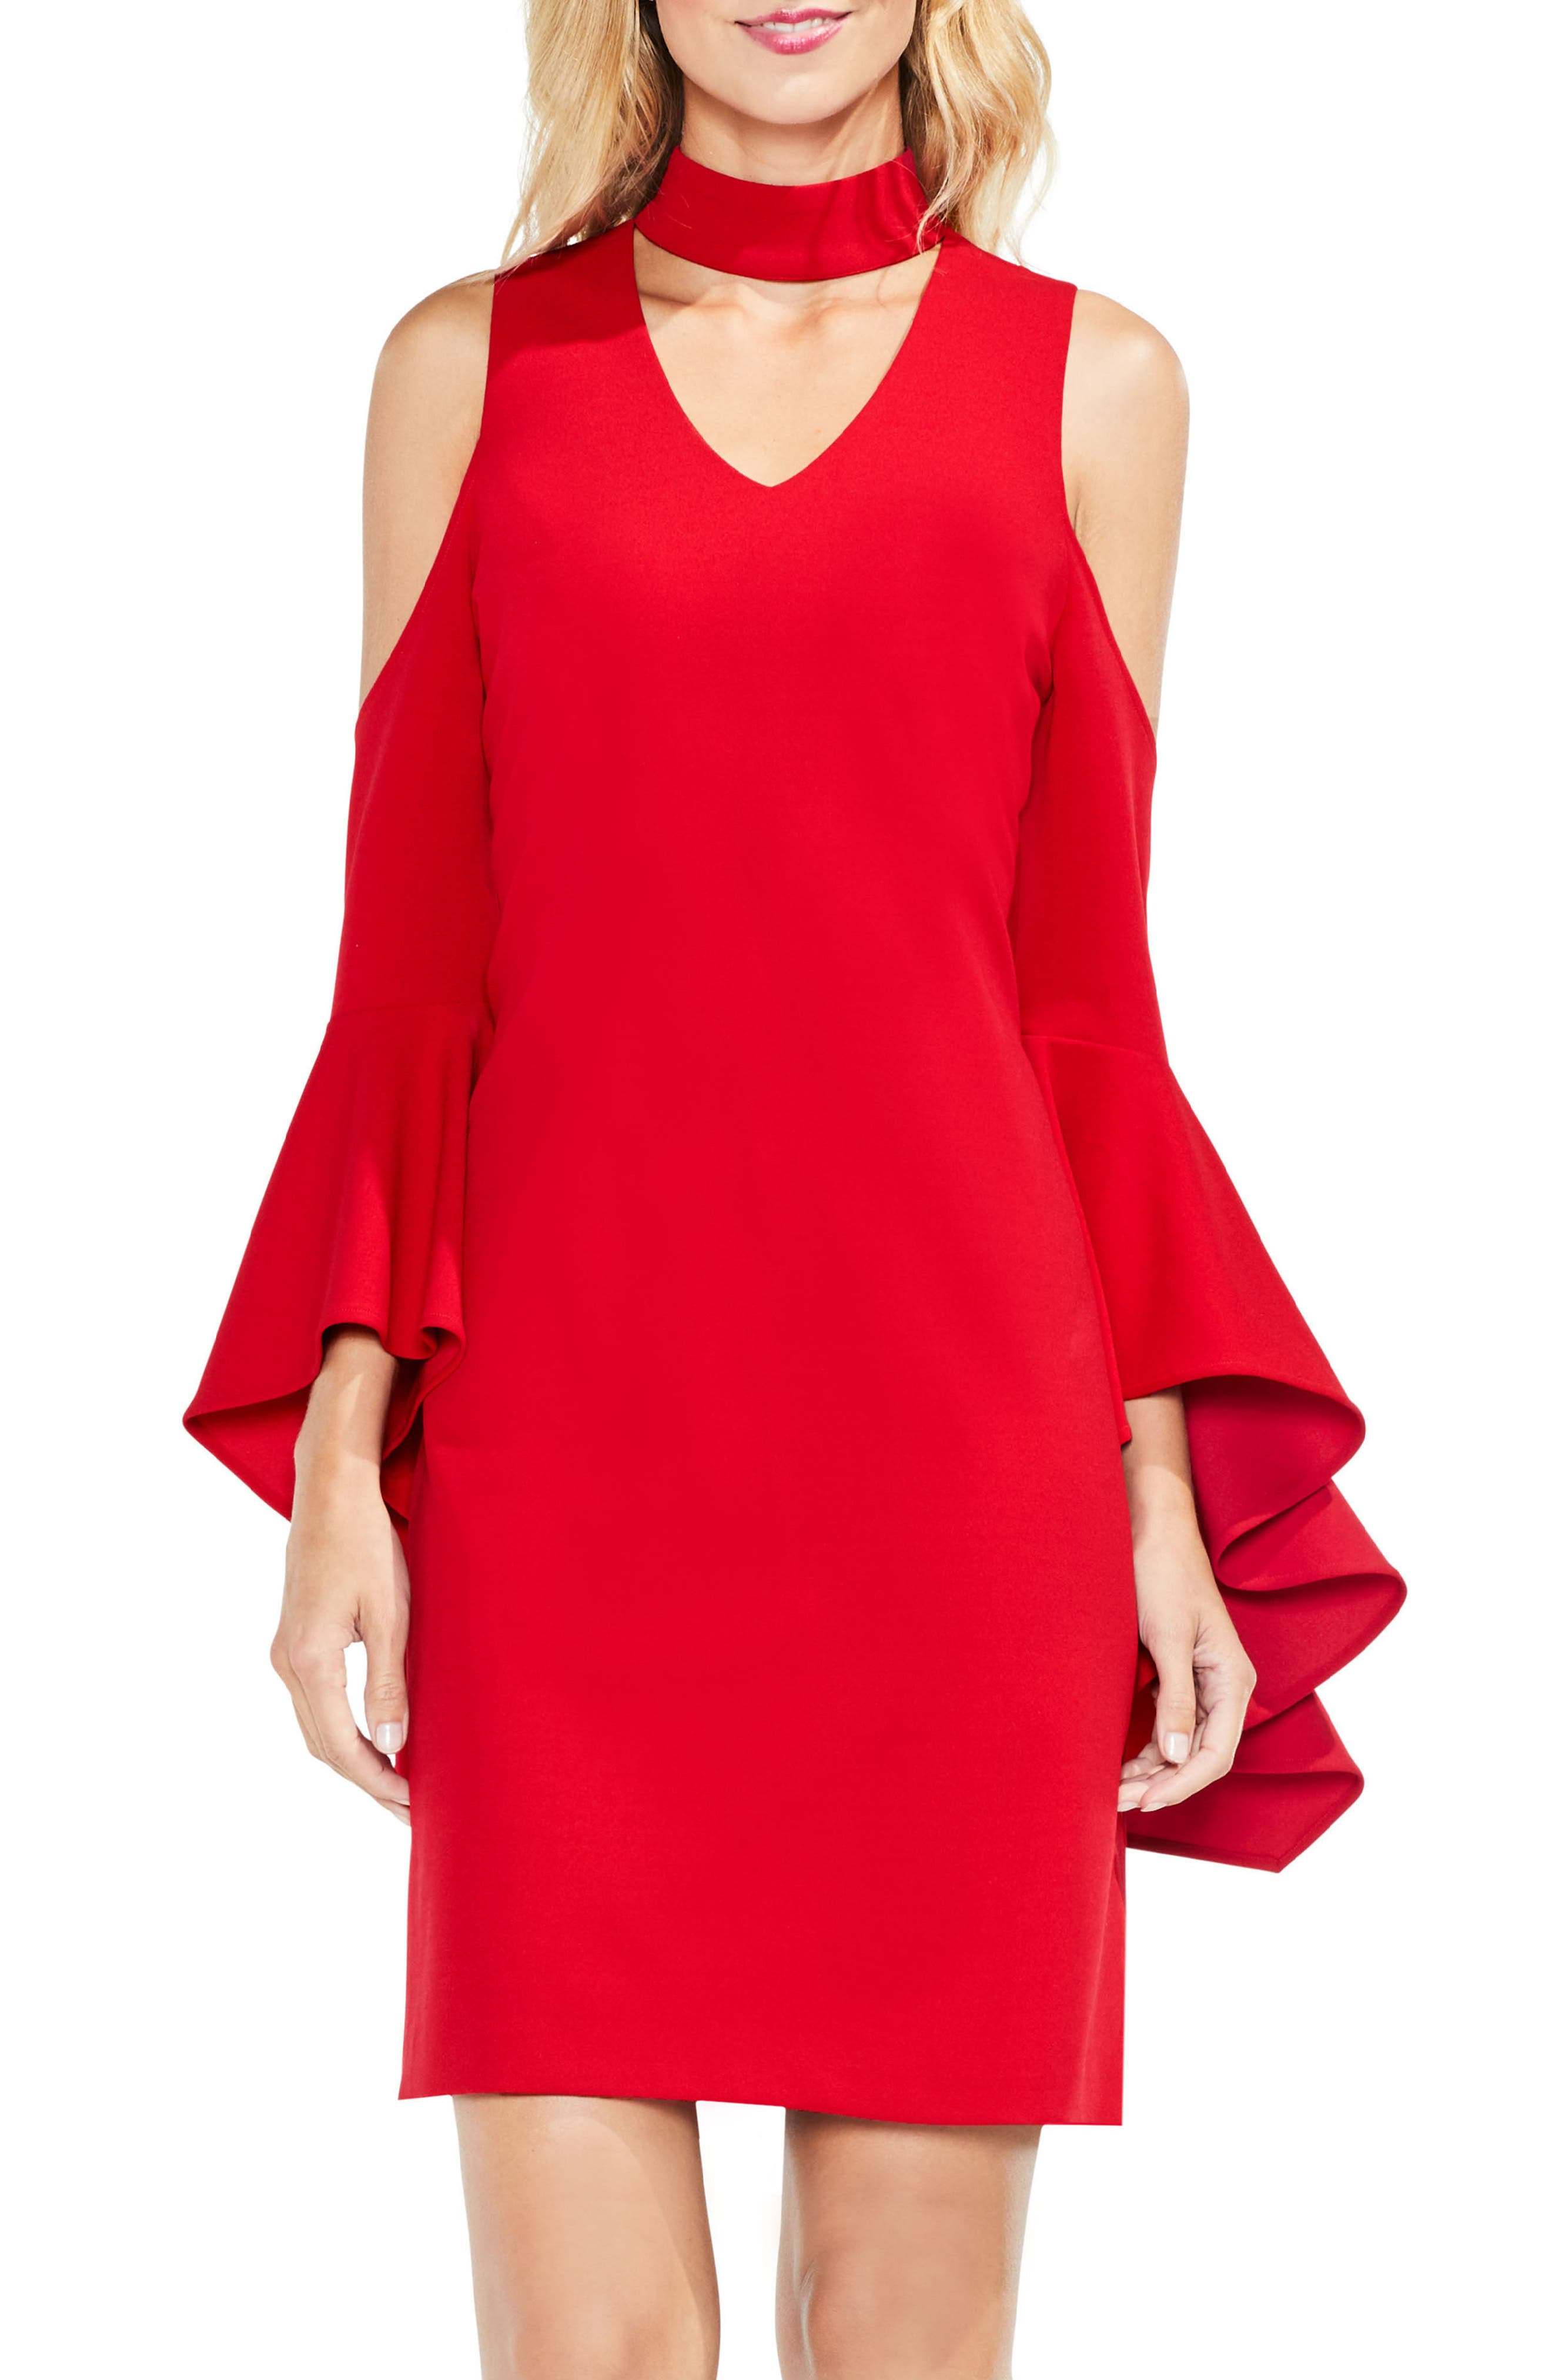 Main Image - Vince Camuto Cold Shoulder Bell Sleeve Dress